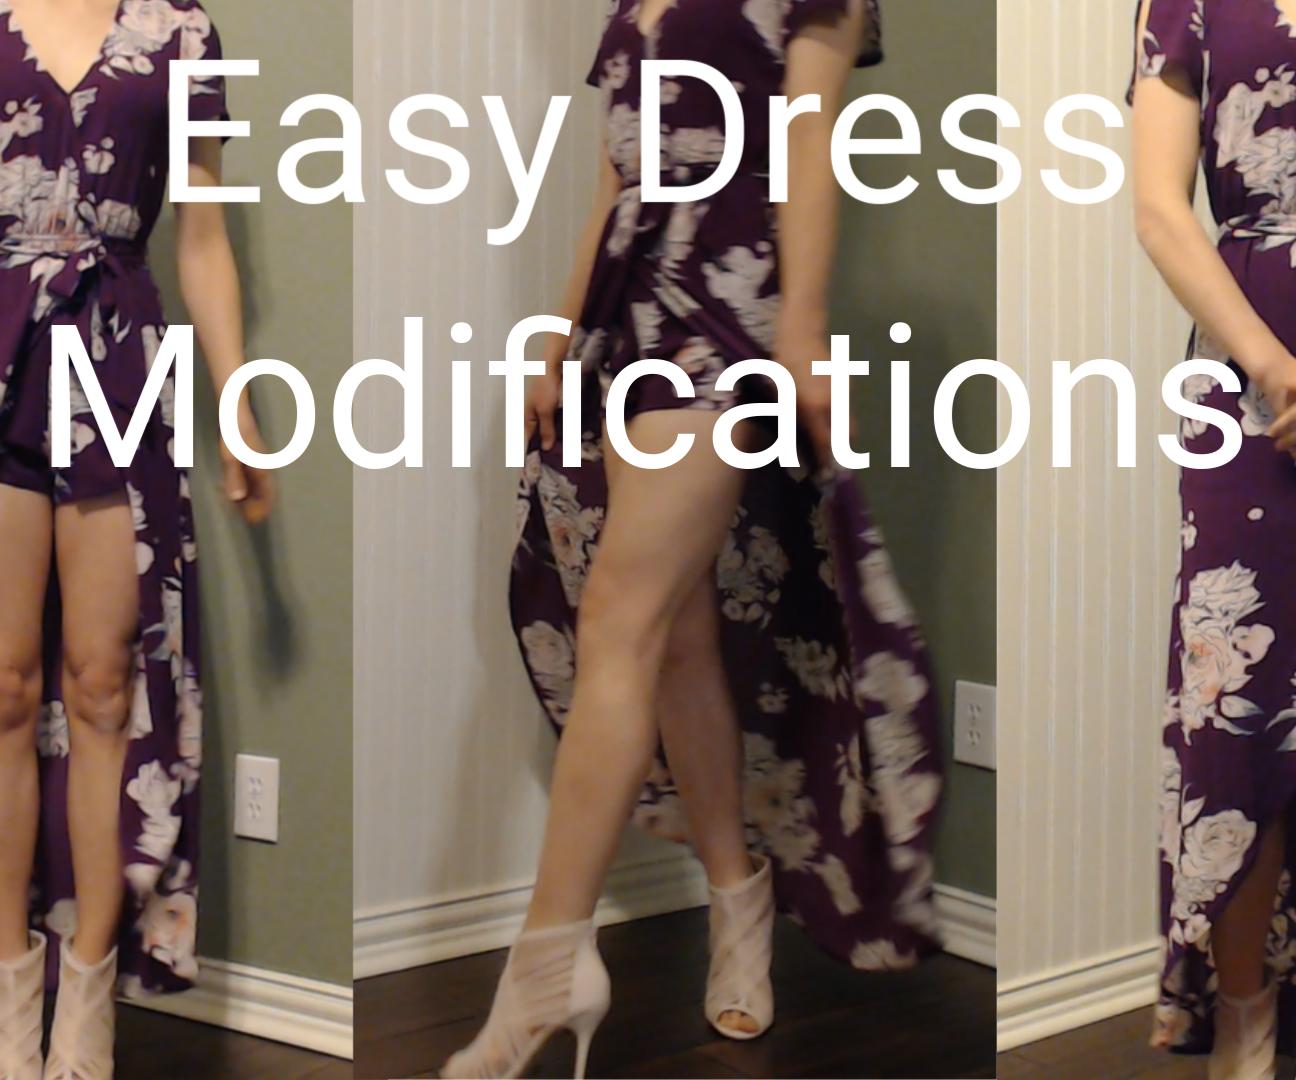 Easy Dress Modifications